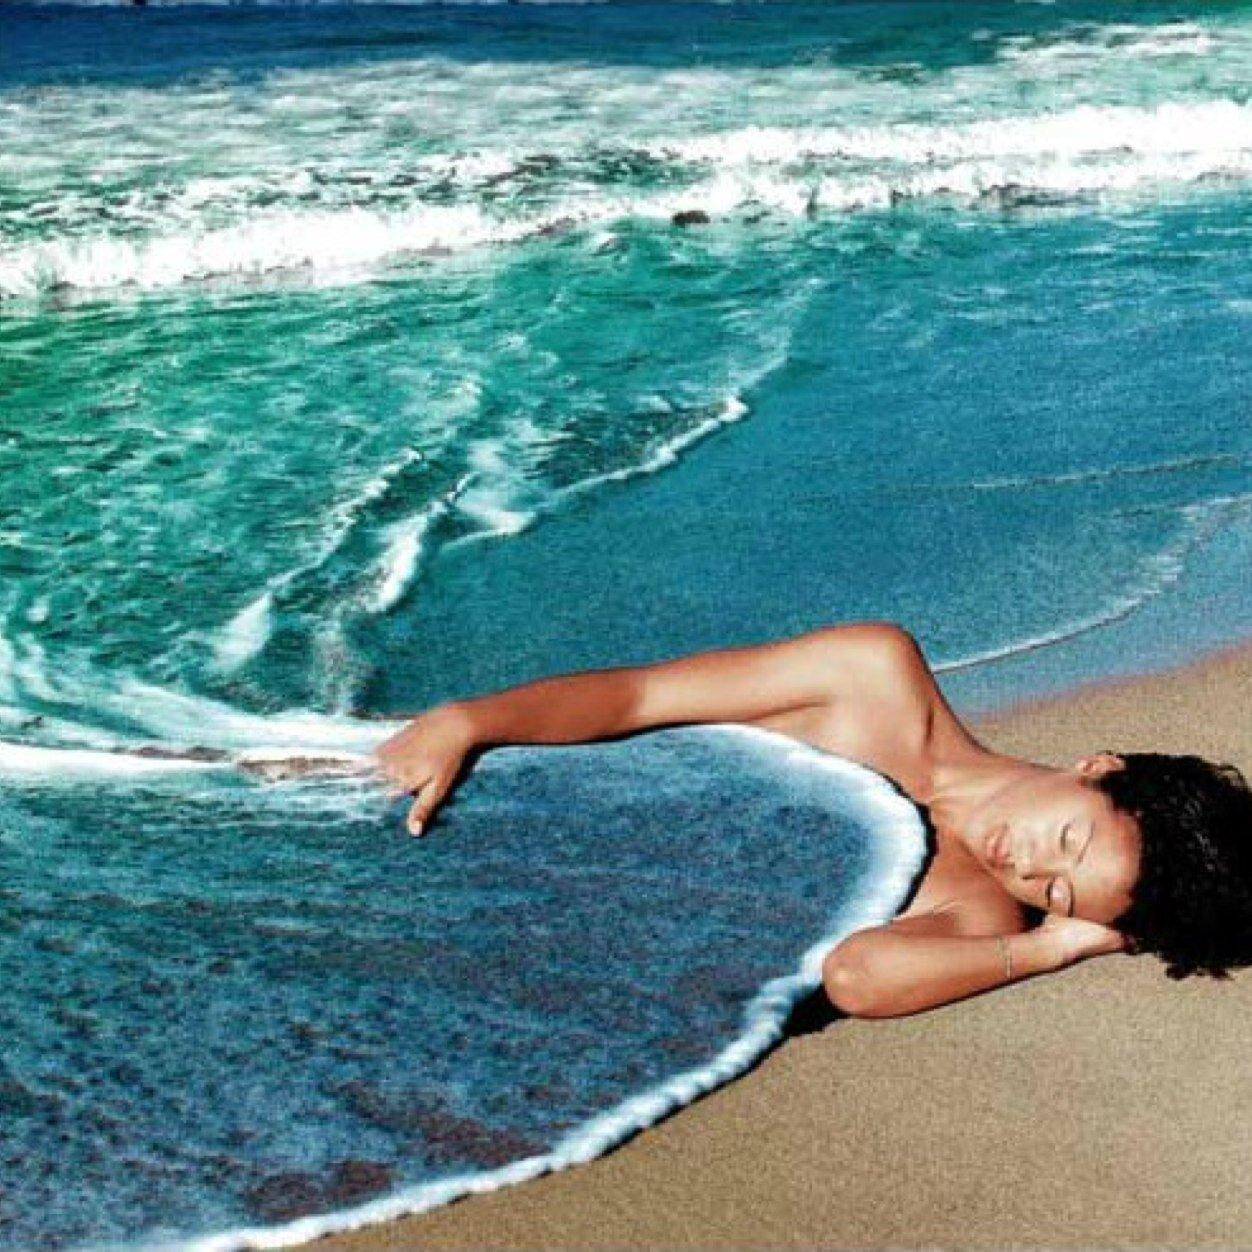 Картинки лежа на берегу океана прикольные